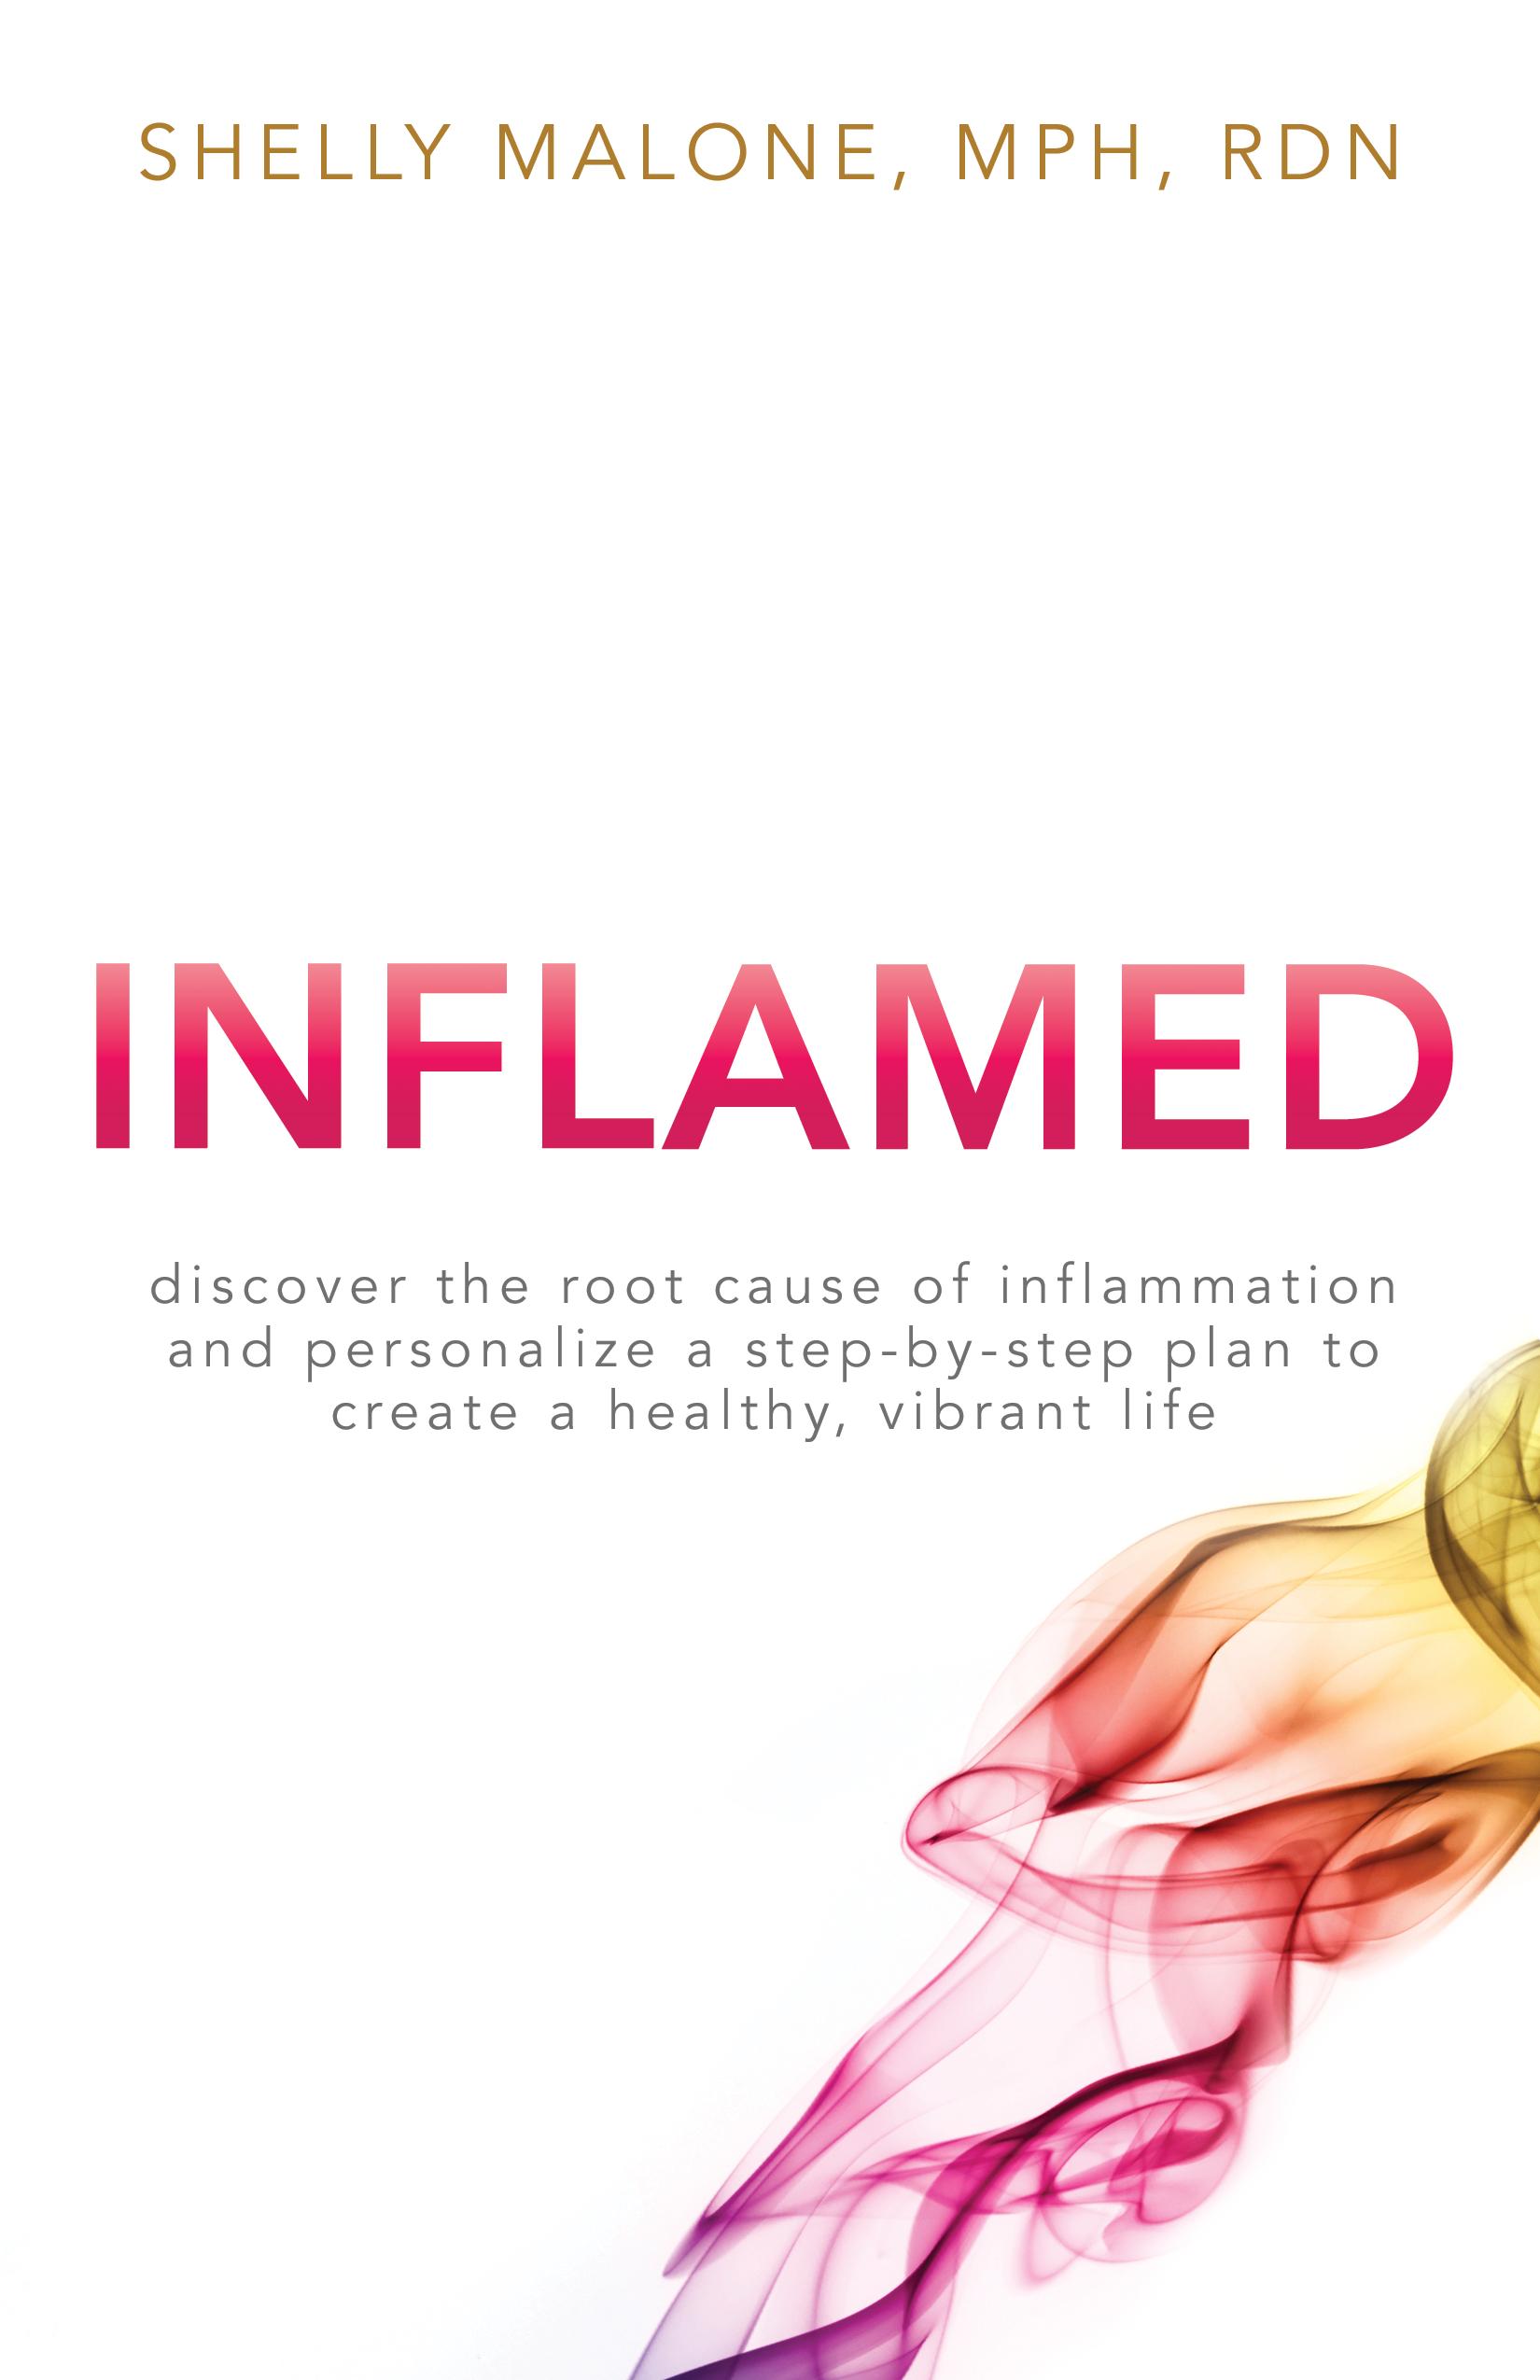 InflamedBookCoverFinal1 [319246]